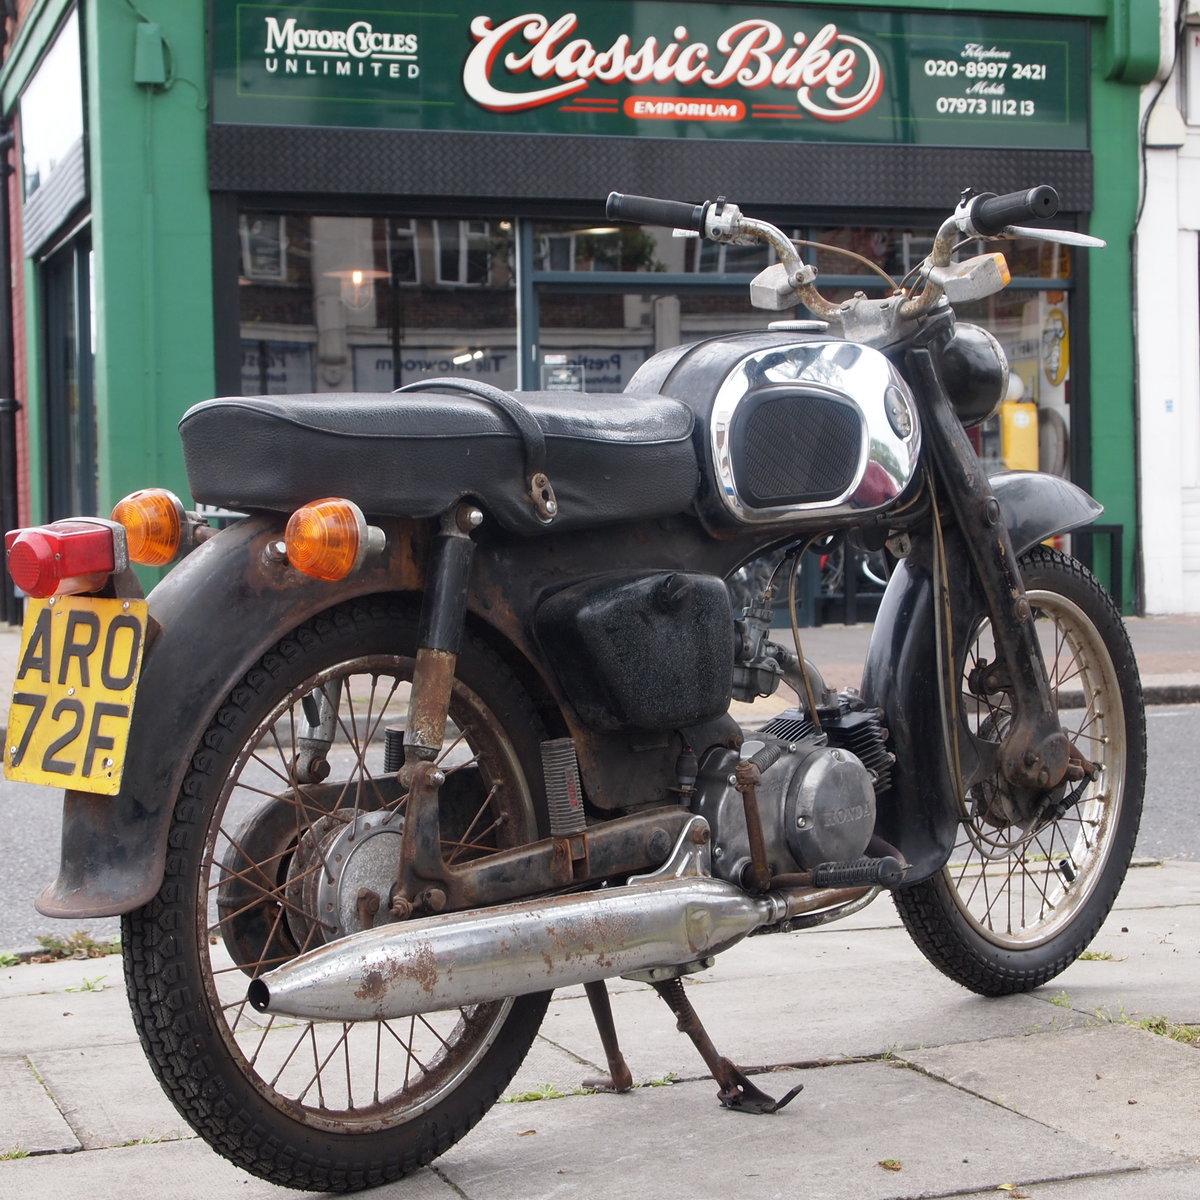 1967 Honda C200 Original Running UK Bike, RESERVED FOR ALAN. SOLD (picture 1 of 6)